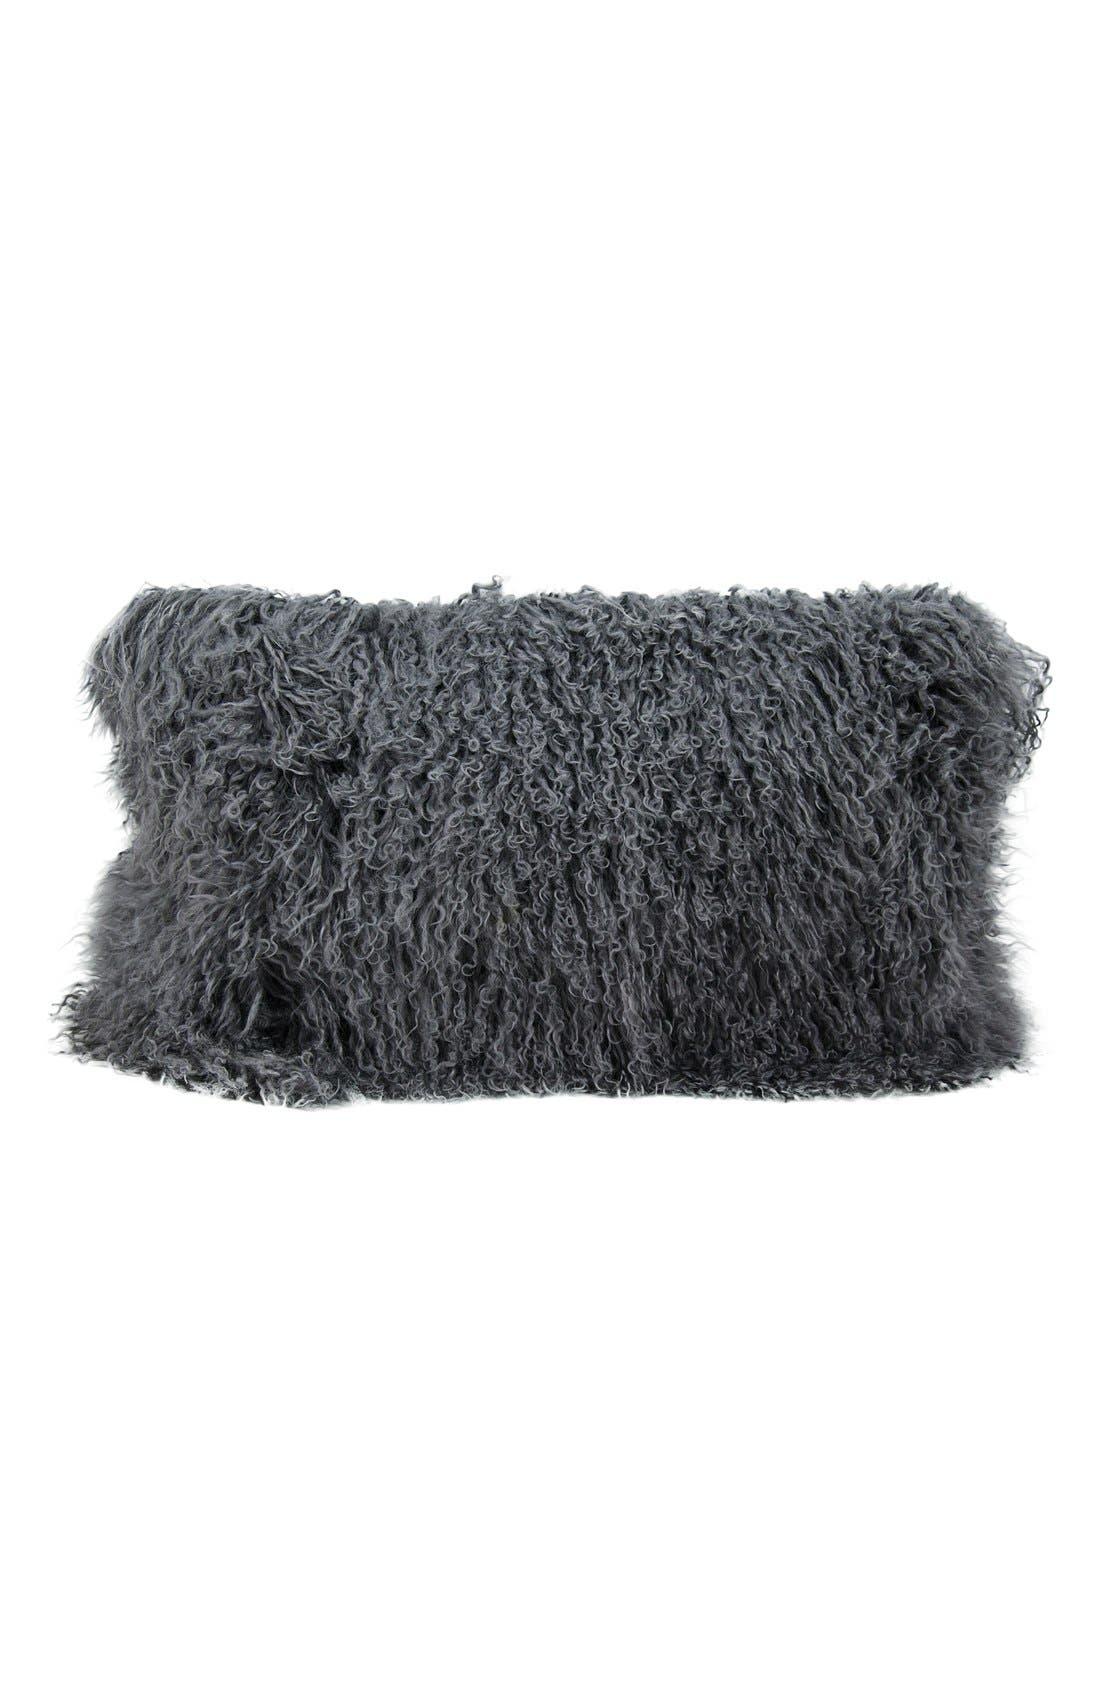 Genuine Tibetan Shearling Pillow,                             Main thumbnail 1, color,                             Silver/ Grey